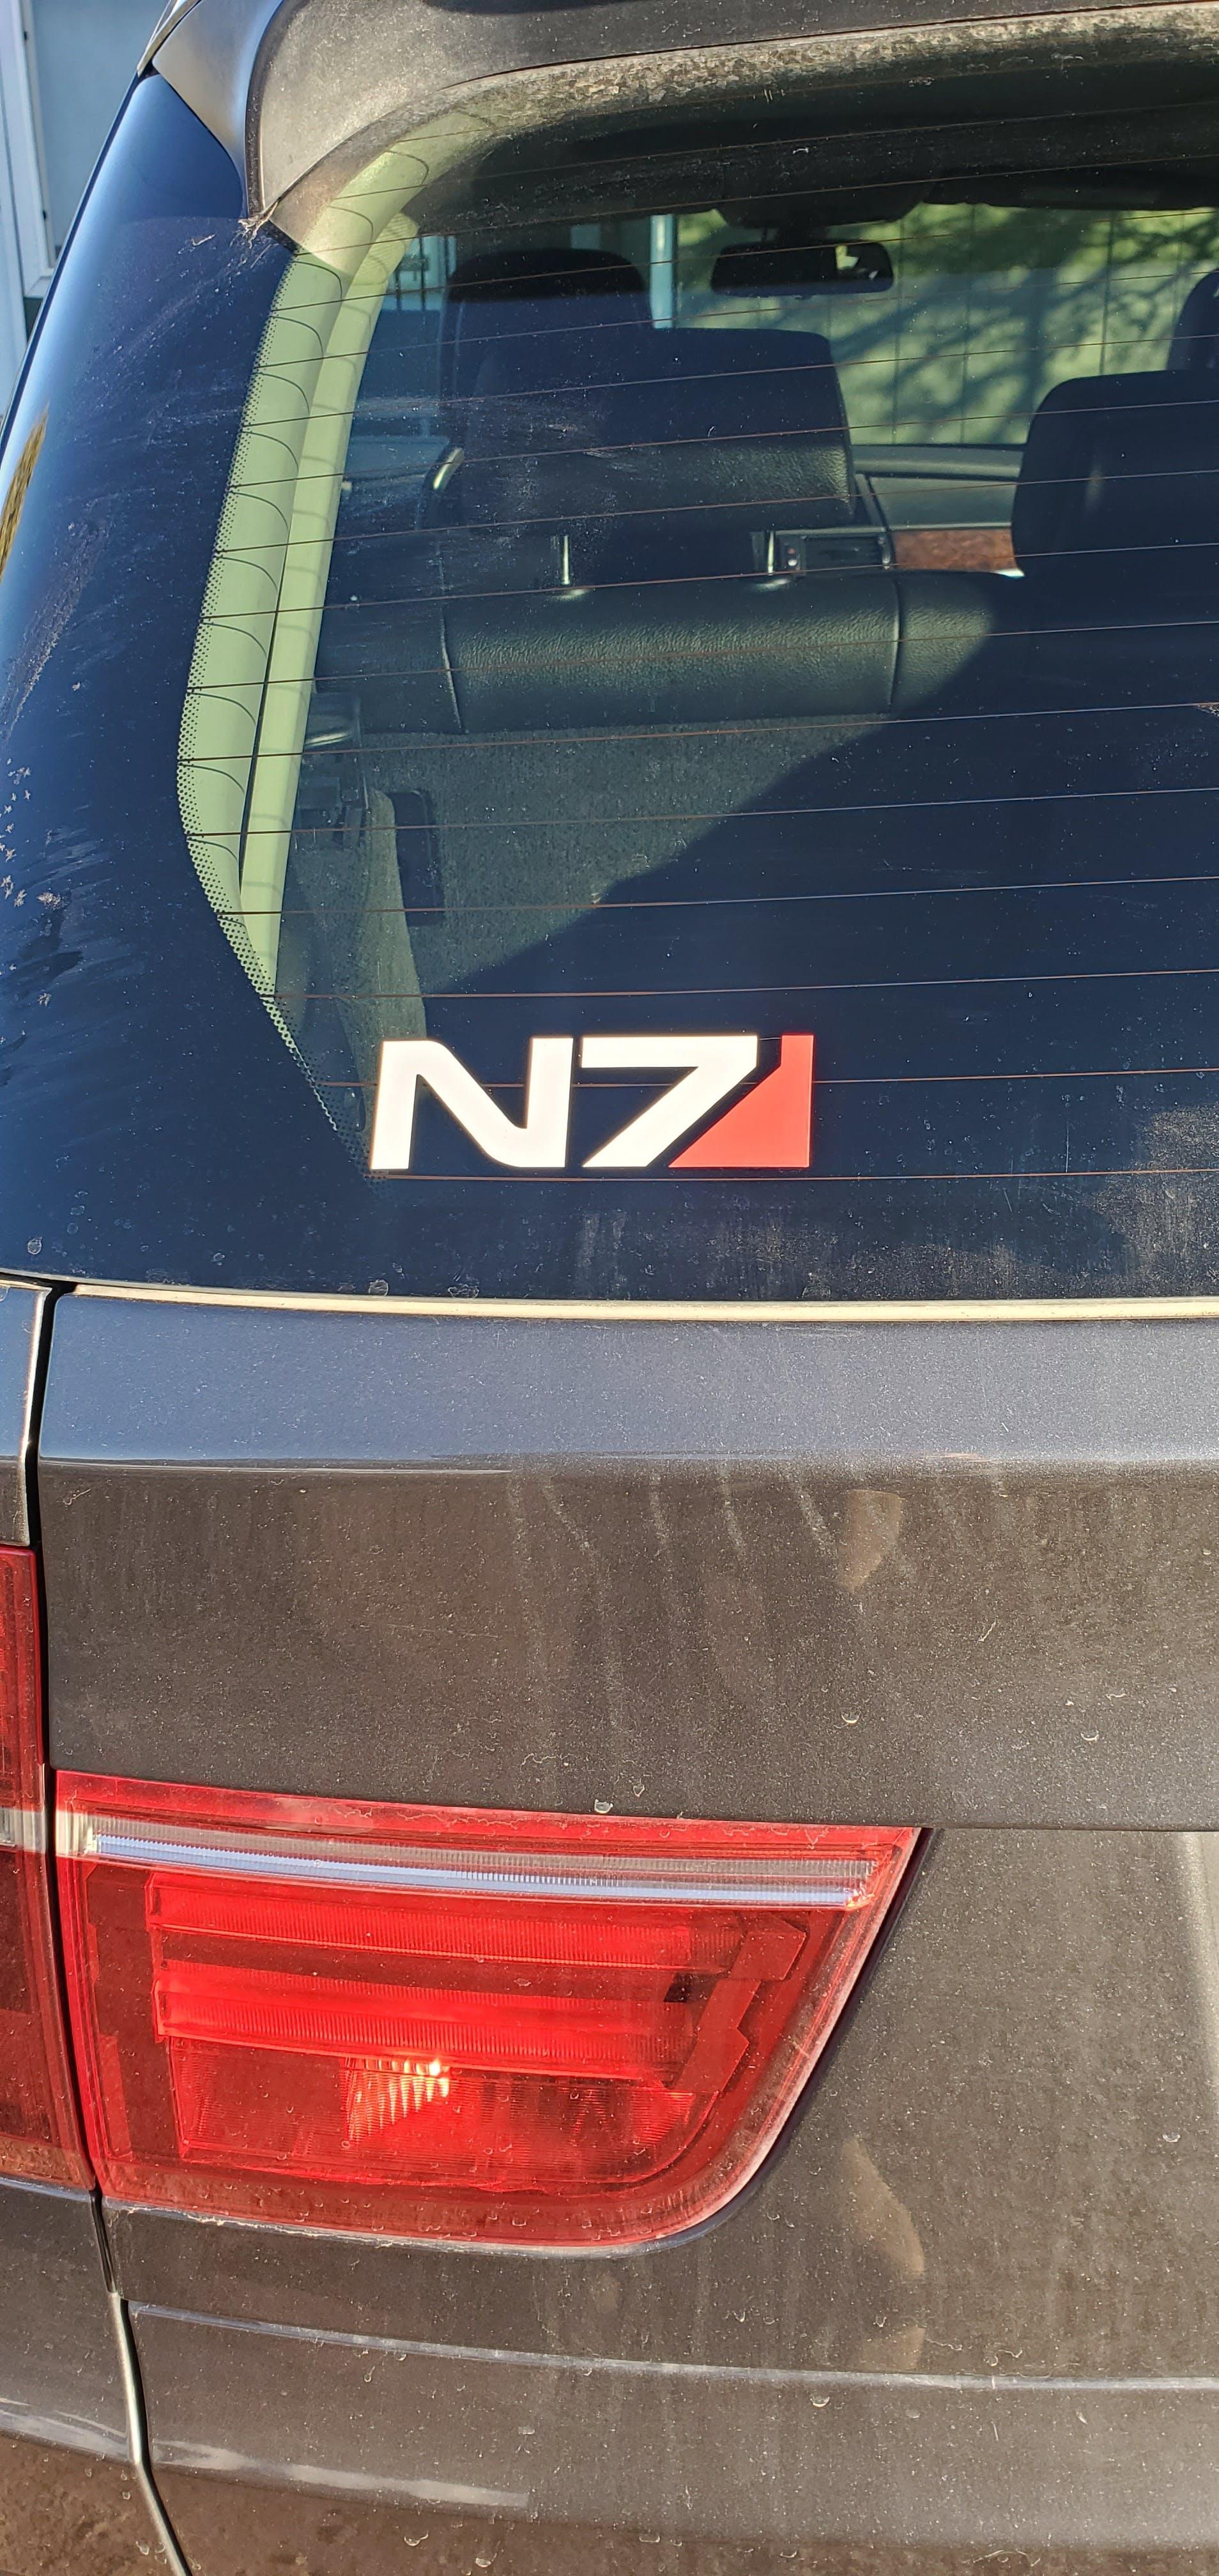 "Mass Effect N7 Adhesive Vinyl Decal Sticker Car Truck Window Bumper Laptop 12/"""